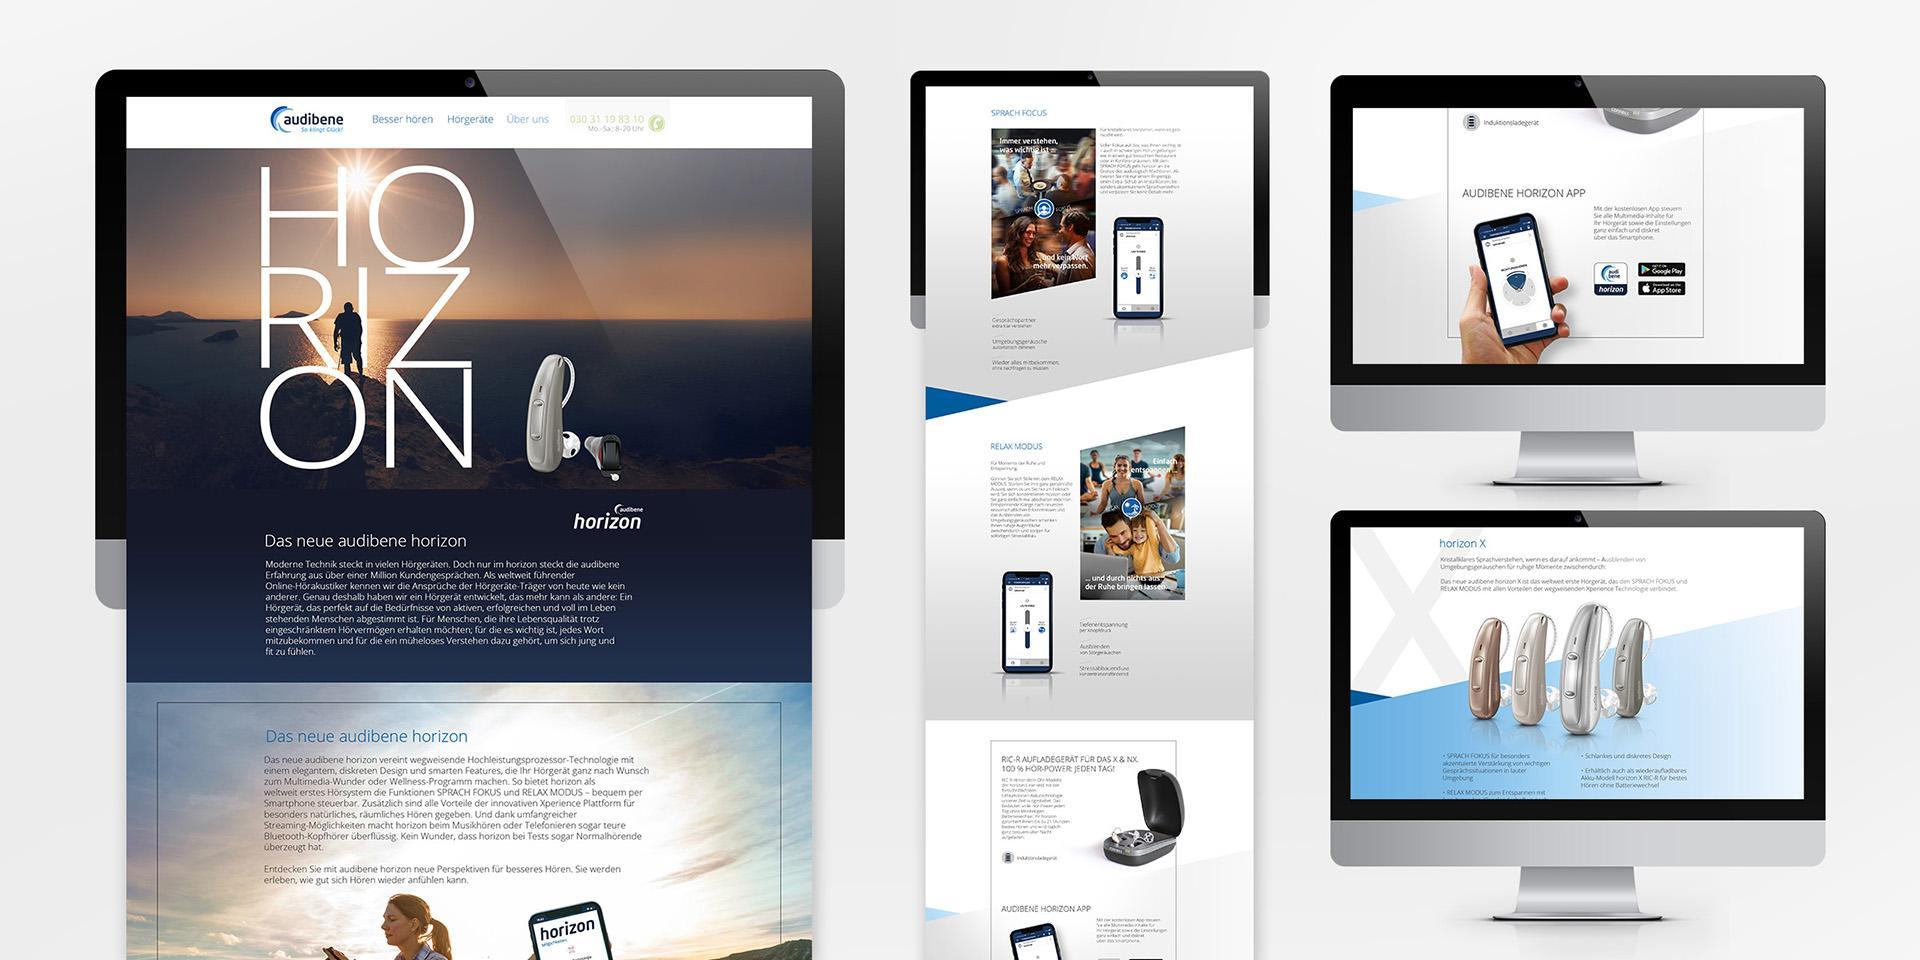 gfd ab website 2 werbeagentur werbung grafik print Kreativ agentur muenchen full service 360 marketing